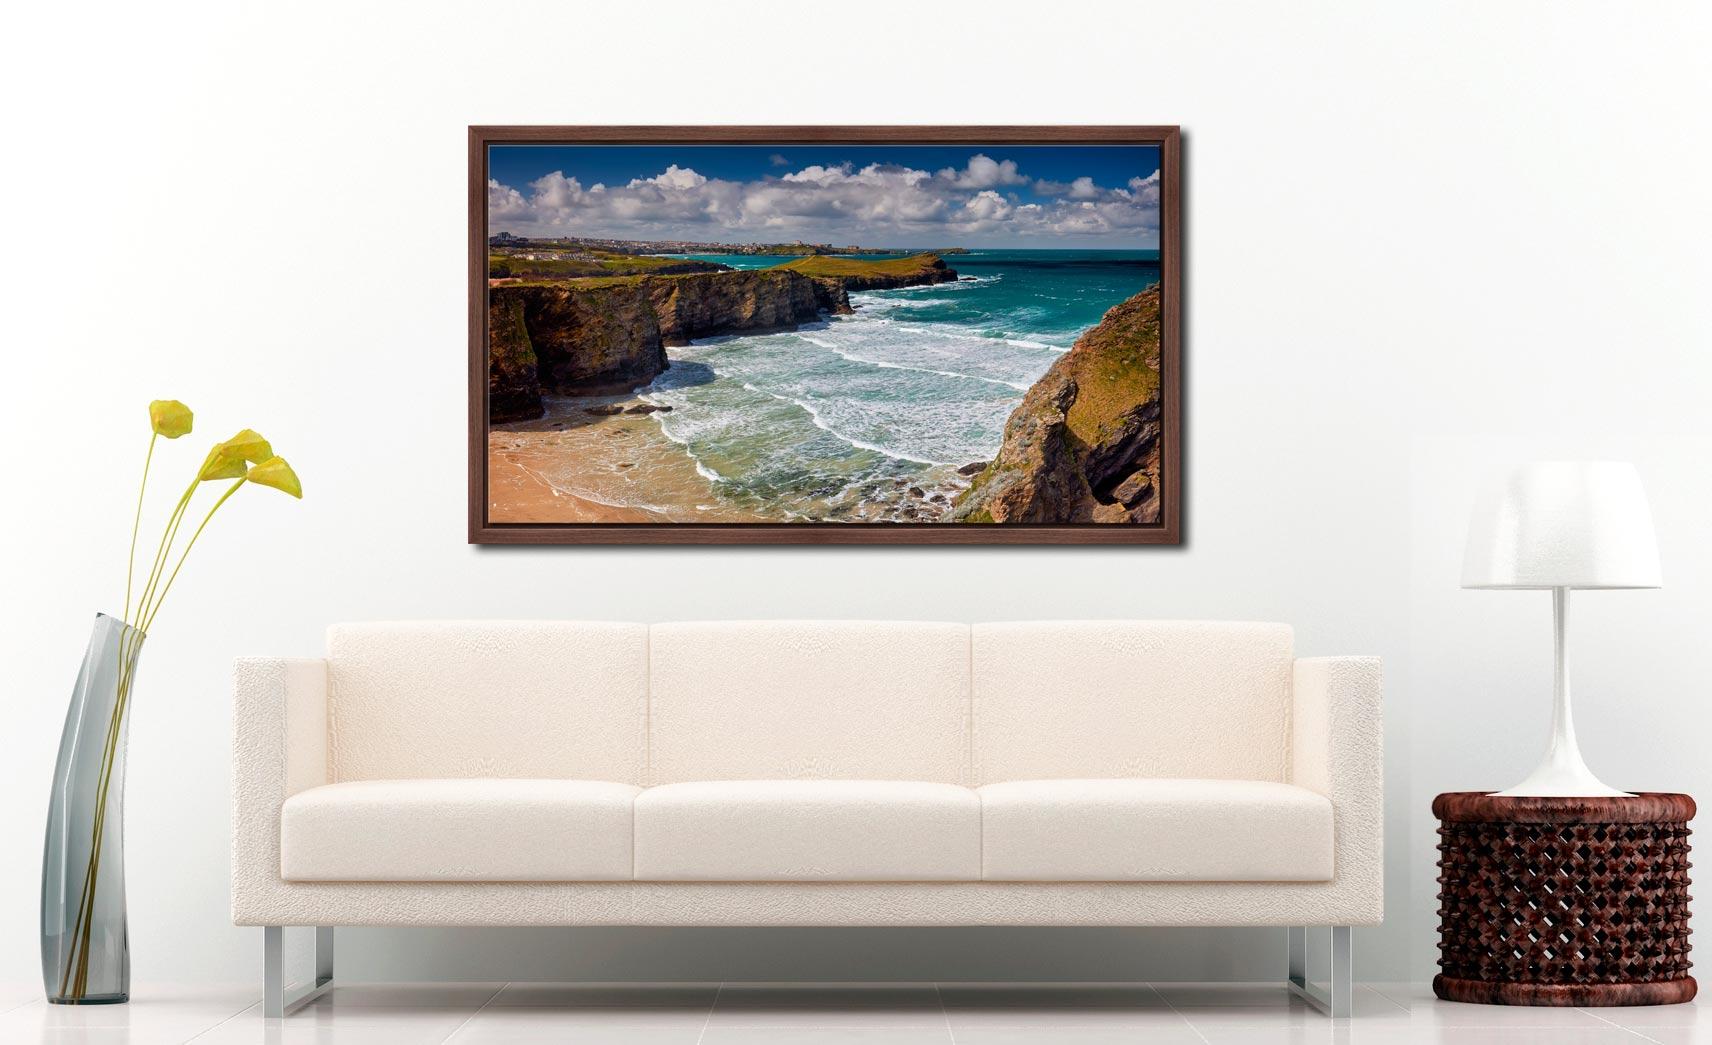 Porth Island - Walnut floater frame with acrylic glazing on Wall